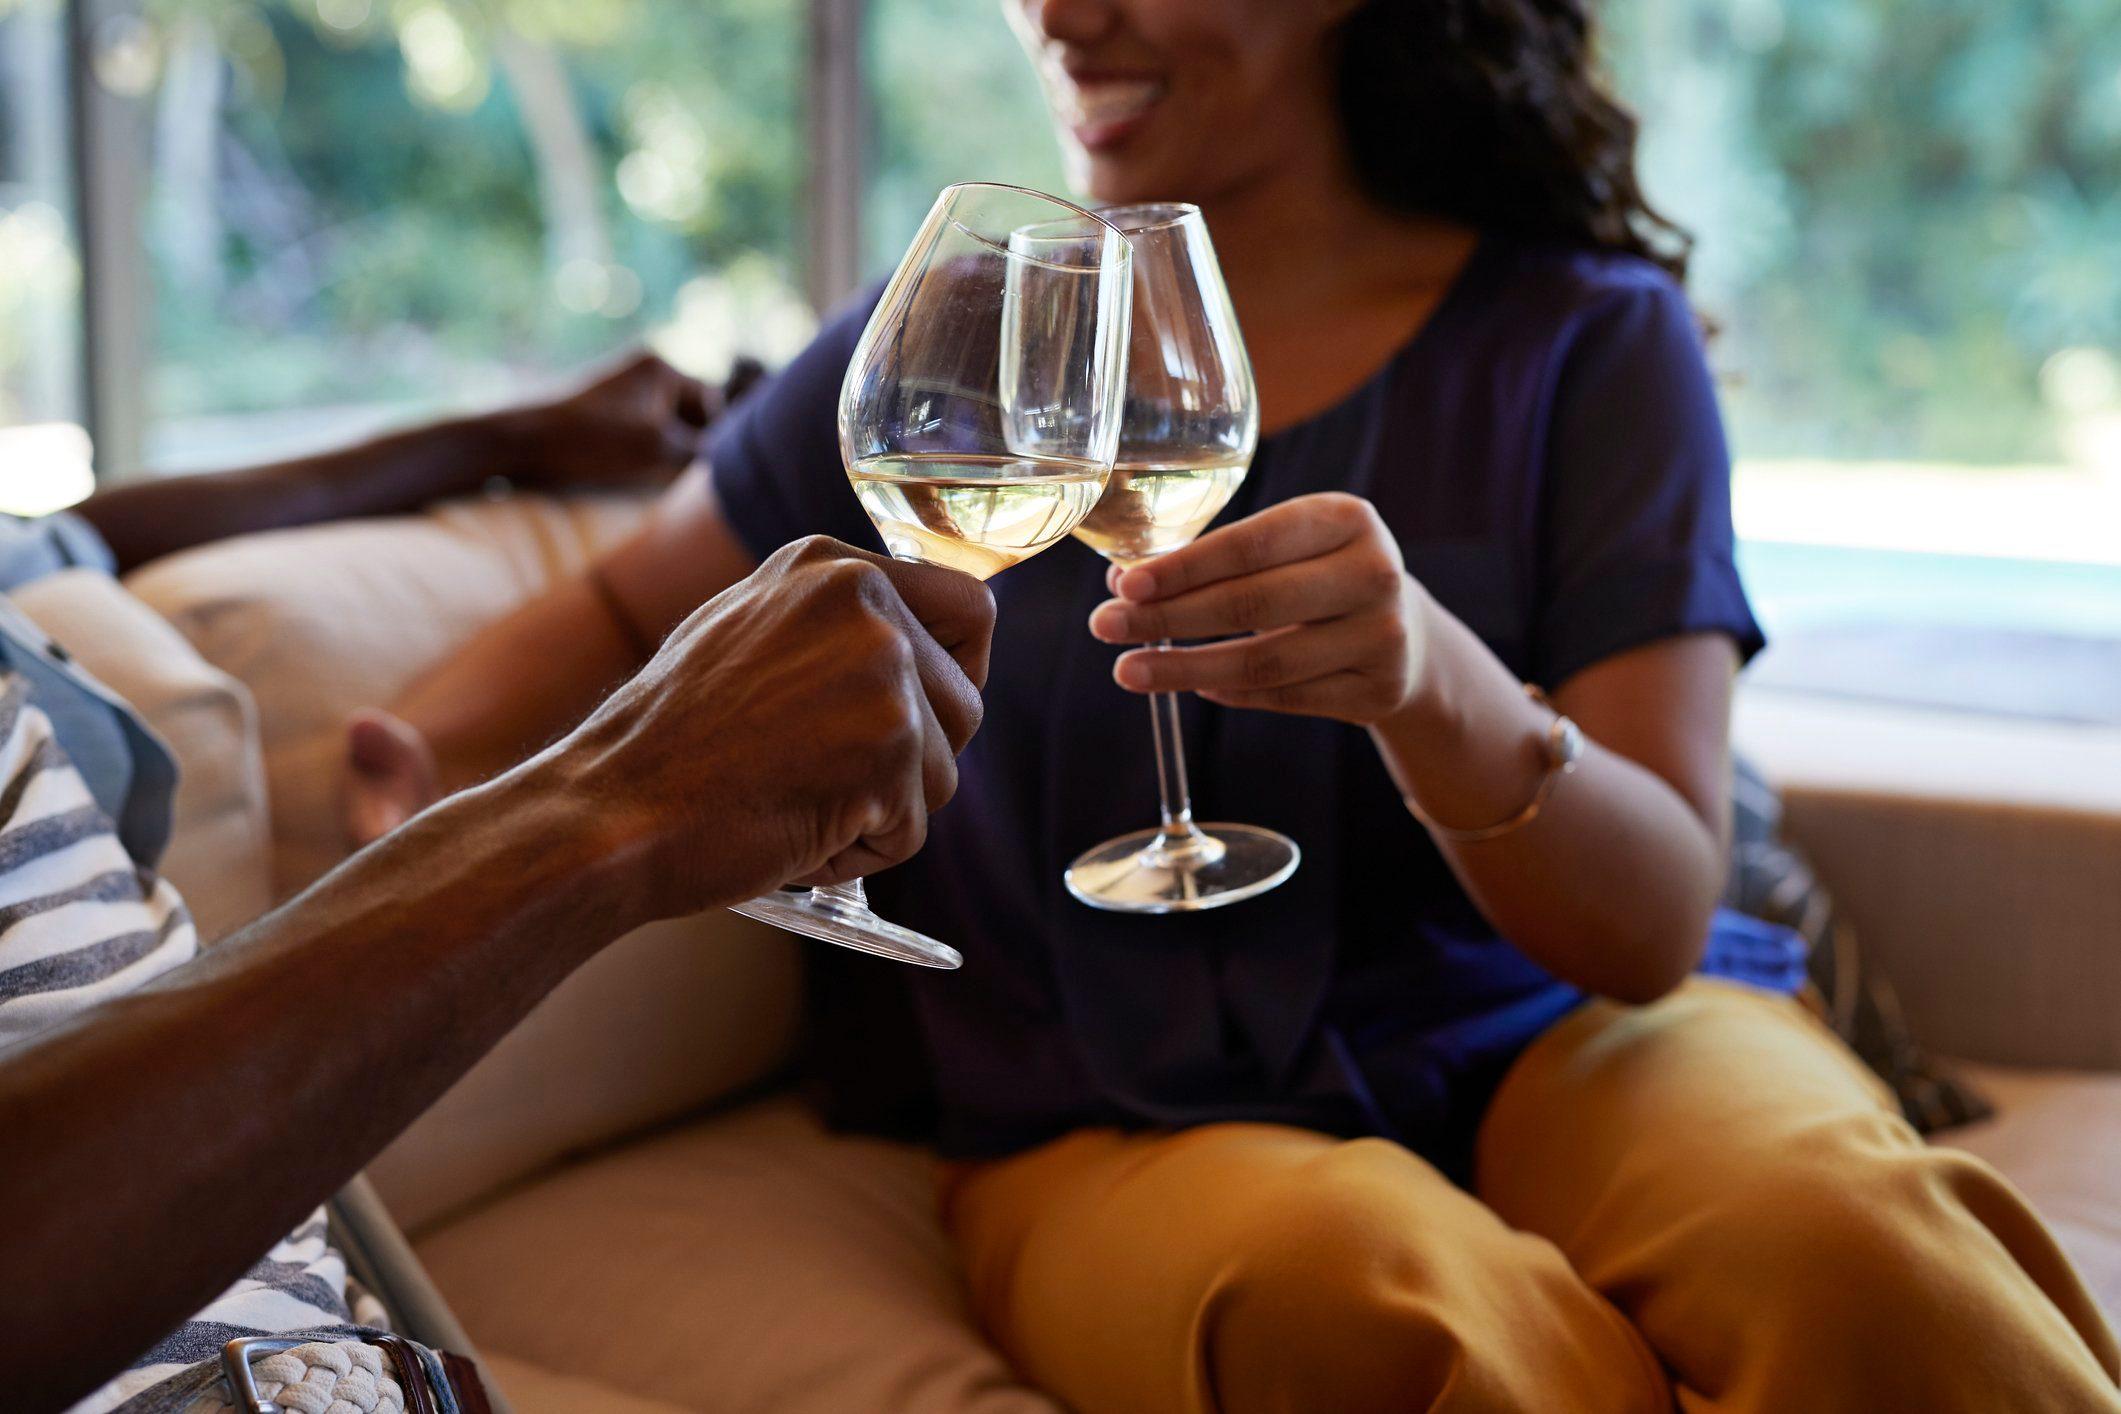 Couple toasting in wine